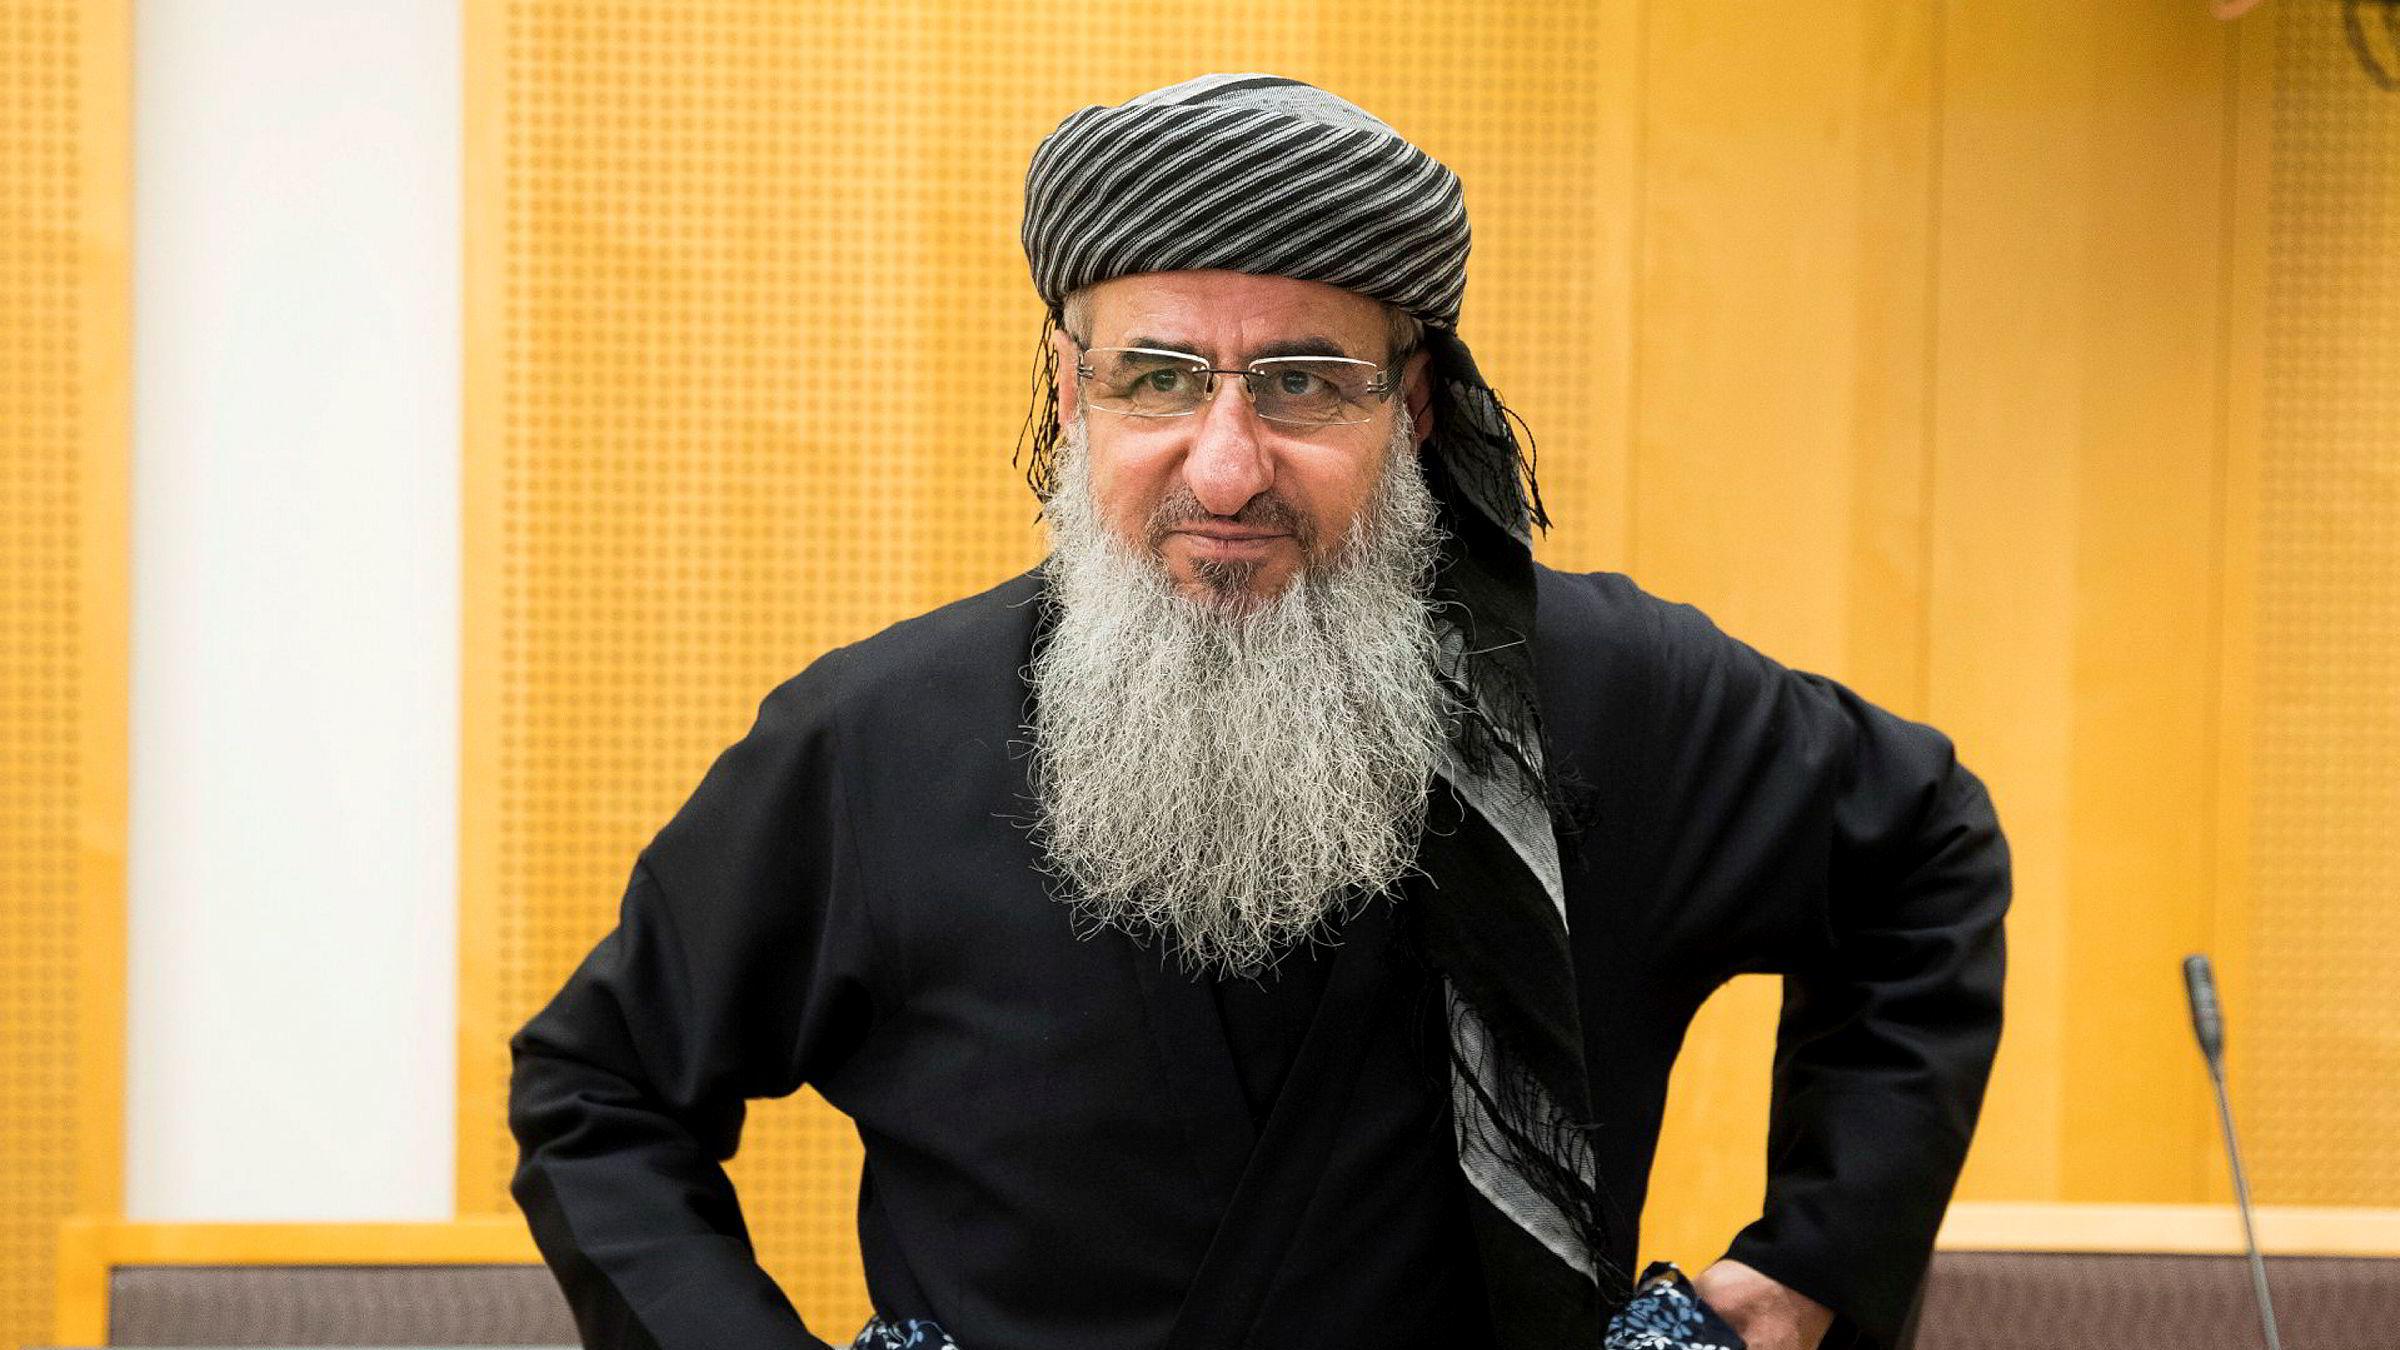 Najmuddin Faraj Ahmad, kjent som mulla Krekar, kan utleveres til Italia.